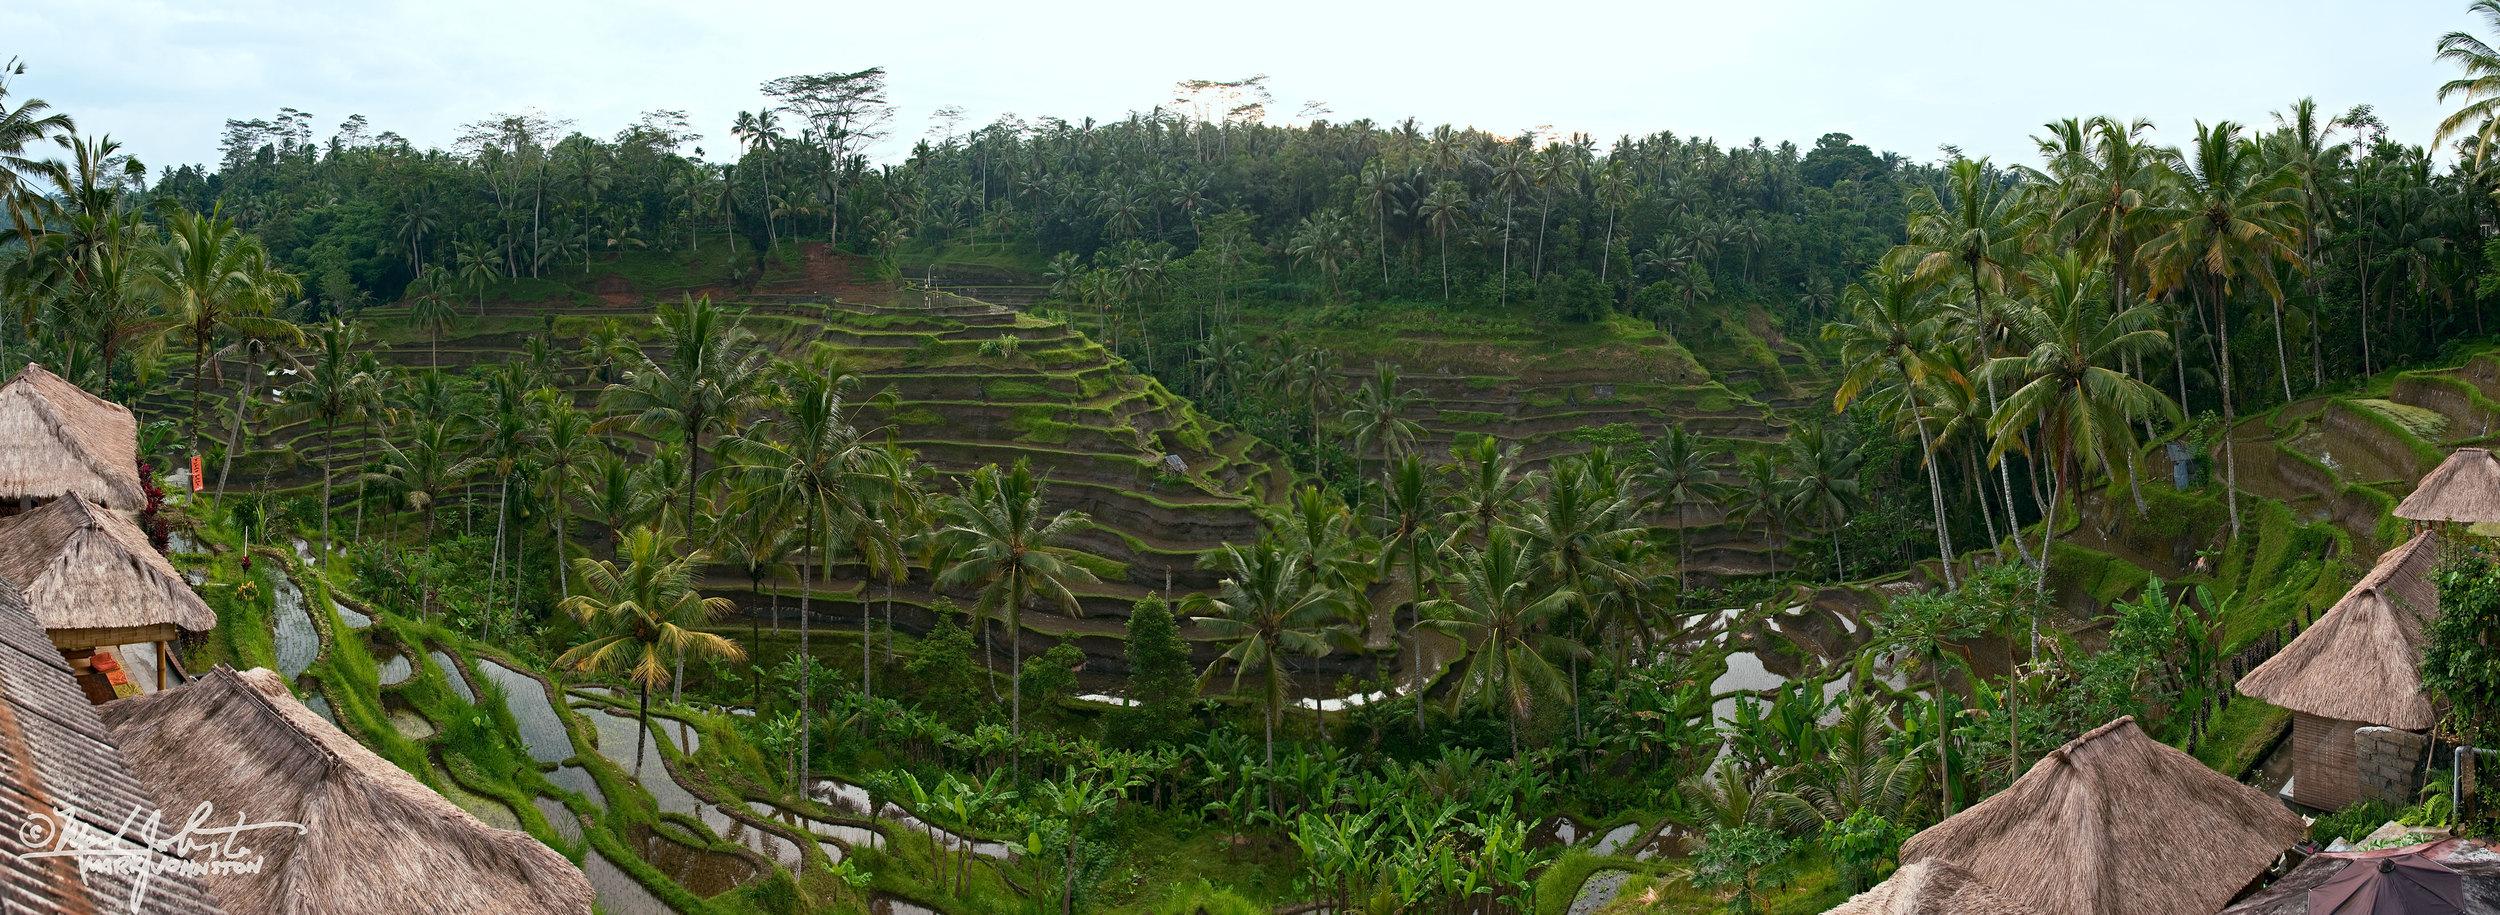 Terraced rice fields, Bali, Indonesia.